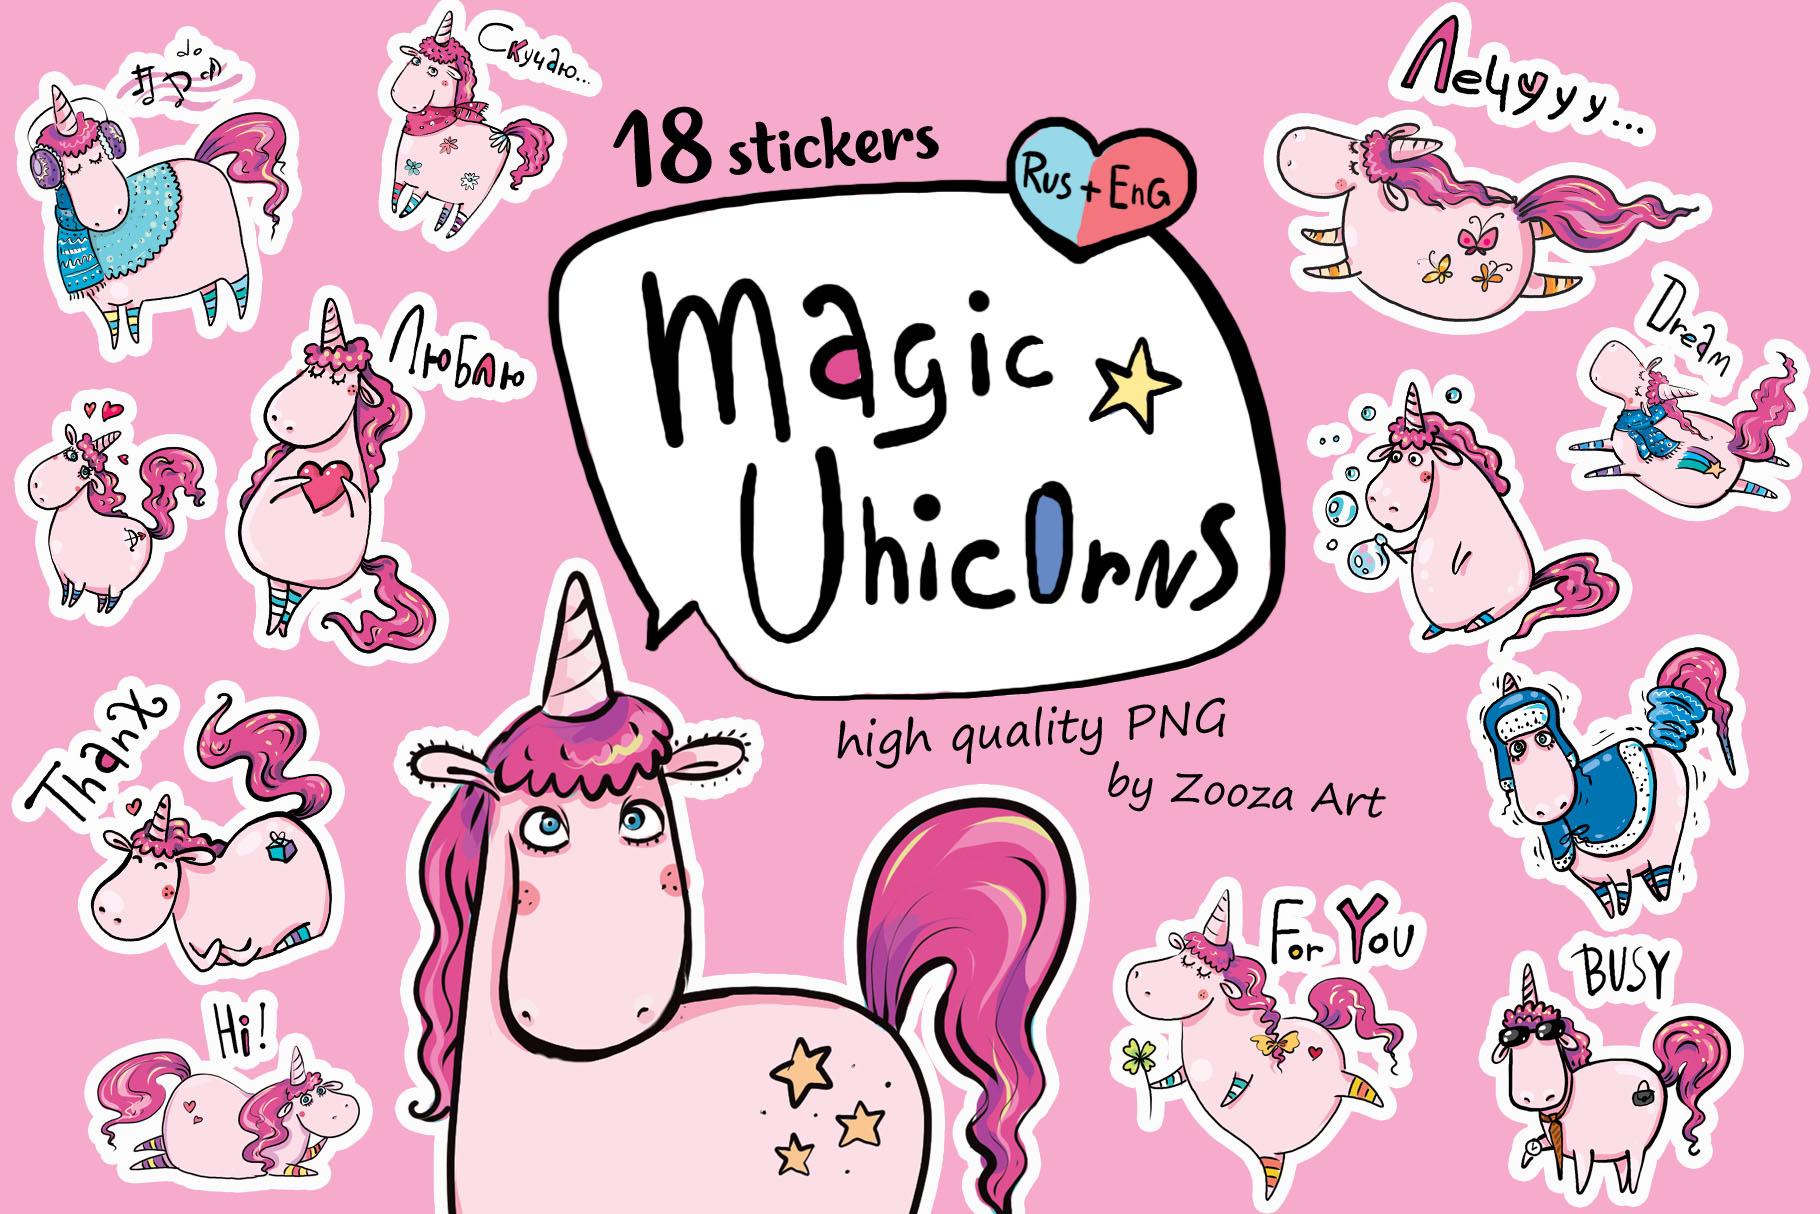 Magic Unicorns 18 stickers Rus-Eng example image 1